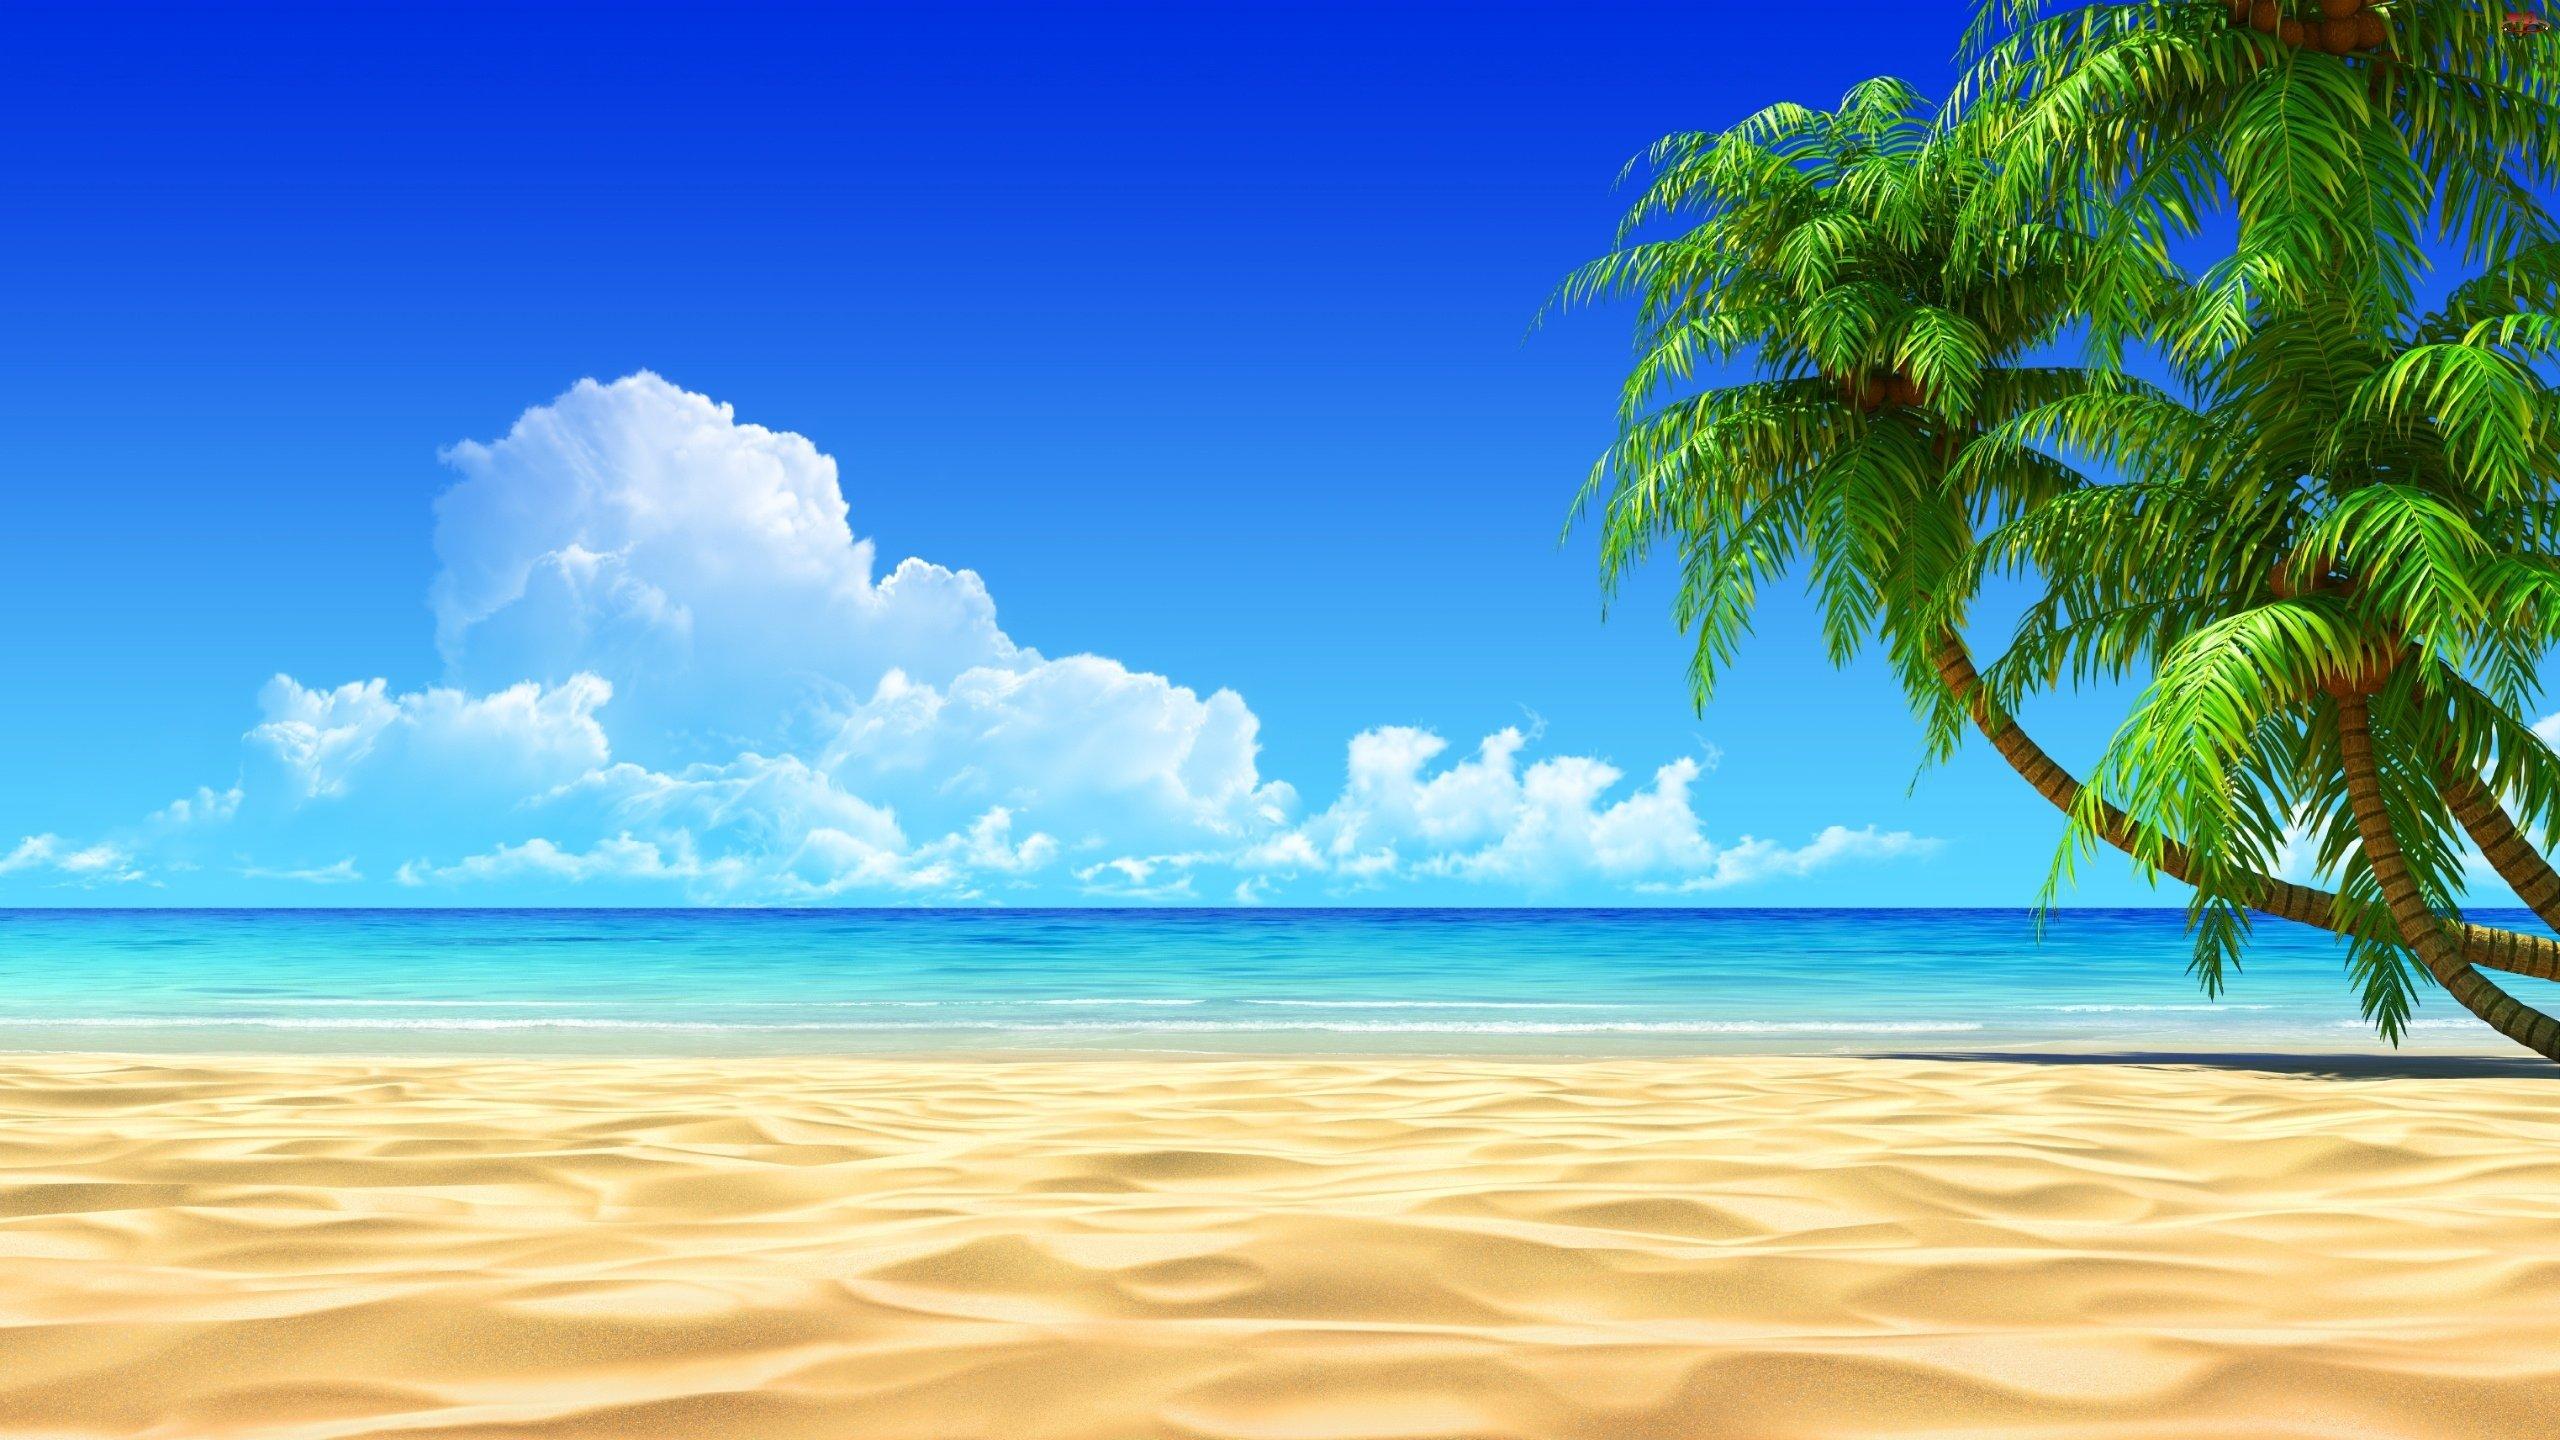 Hd wallpaper beach - Beach Hd Wallpapers Beach Hd Wallpapers Beach Hd Wallpapers Beach